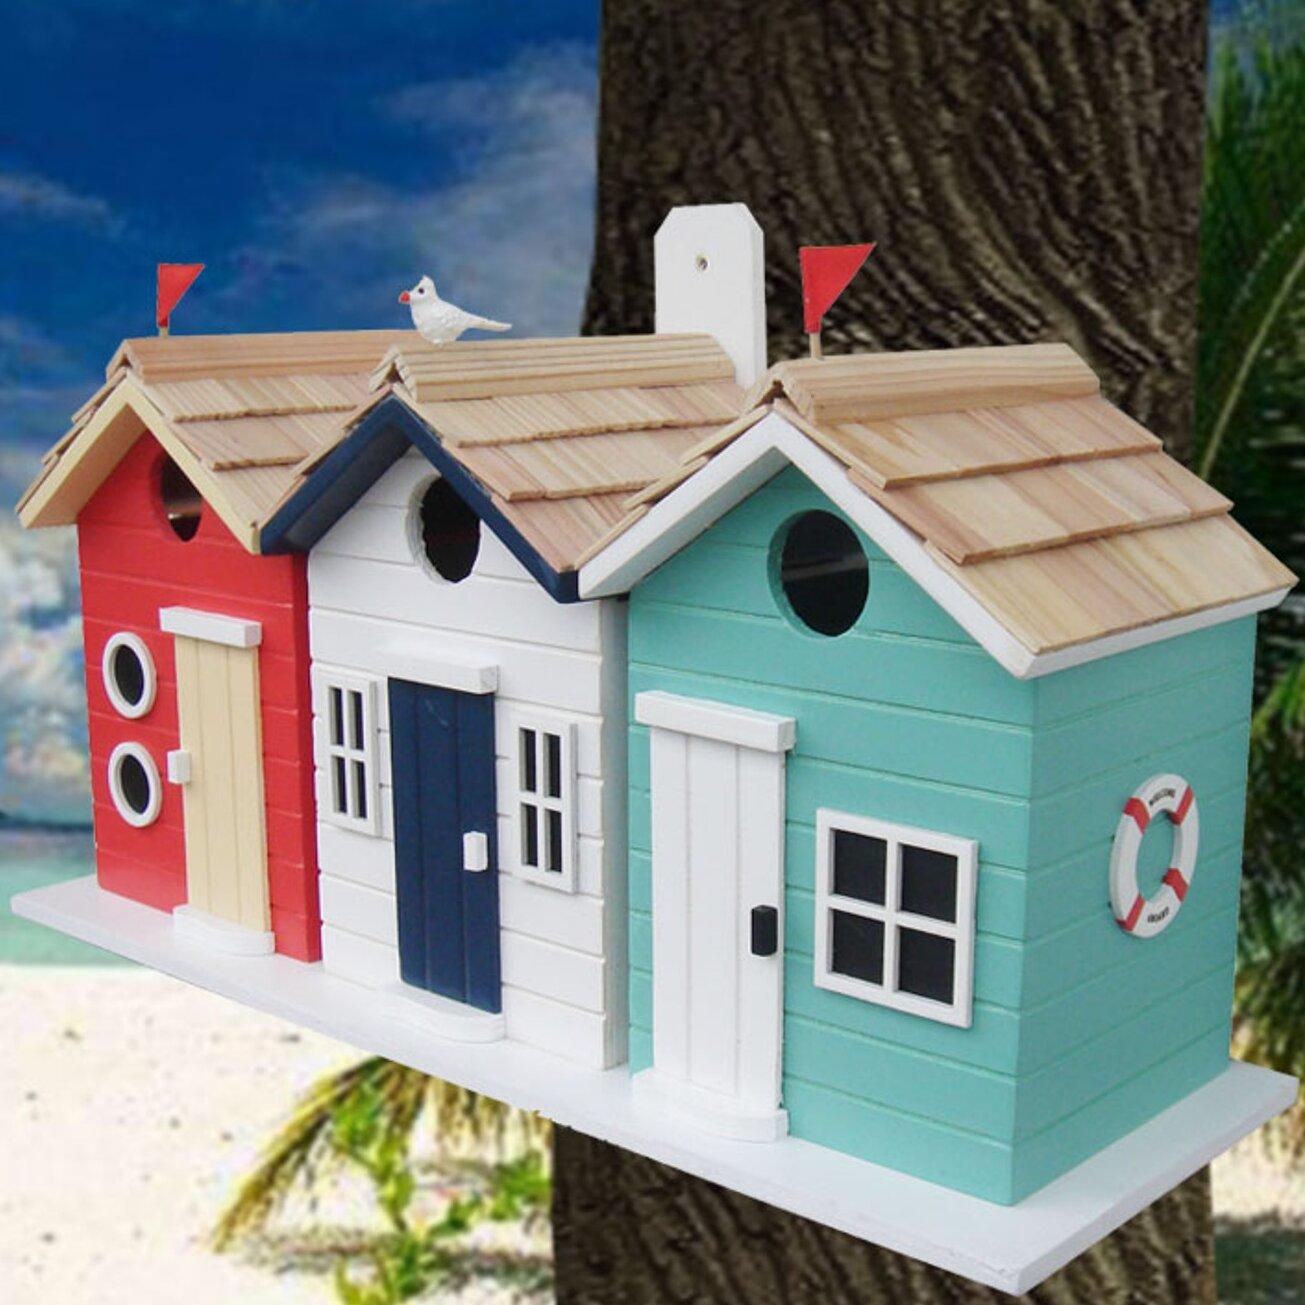 Home Bazaar Birds Of A Feather Series Brighton Beach Huts 8 5 In X 17 In X 6 In Birdhouse Reviews Wayfair